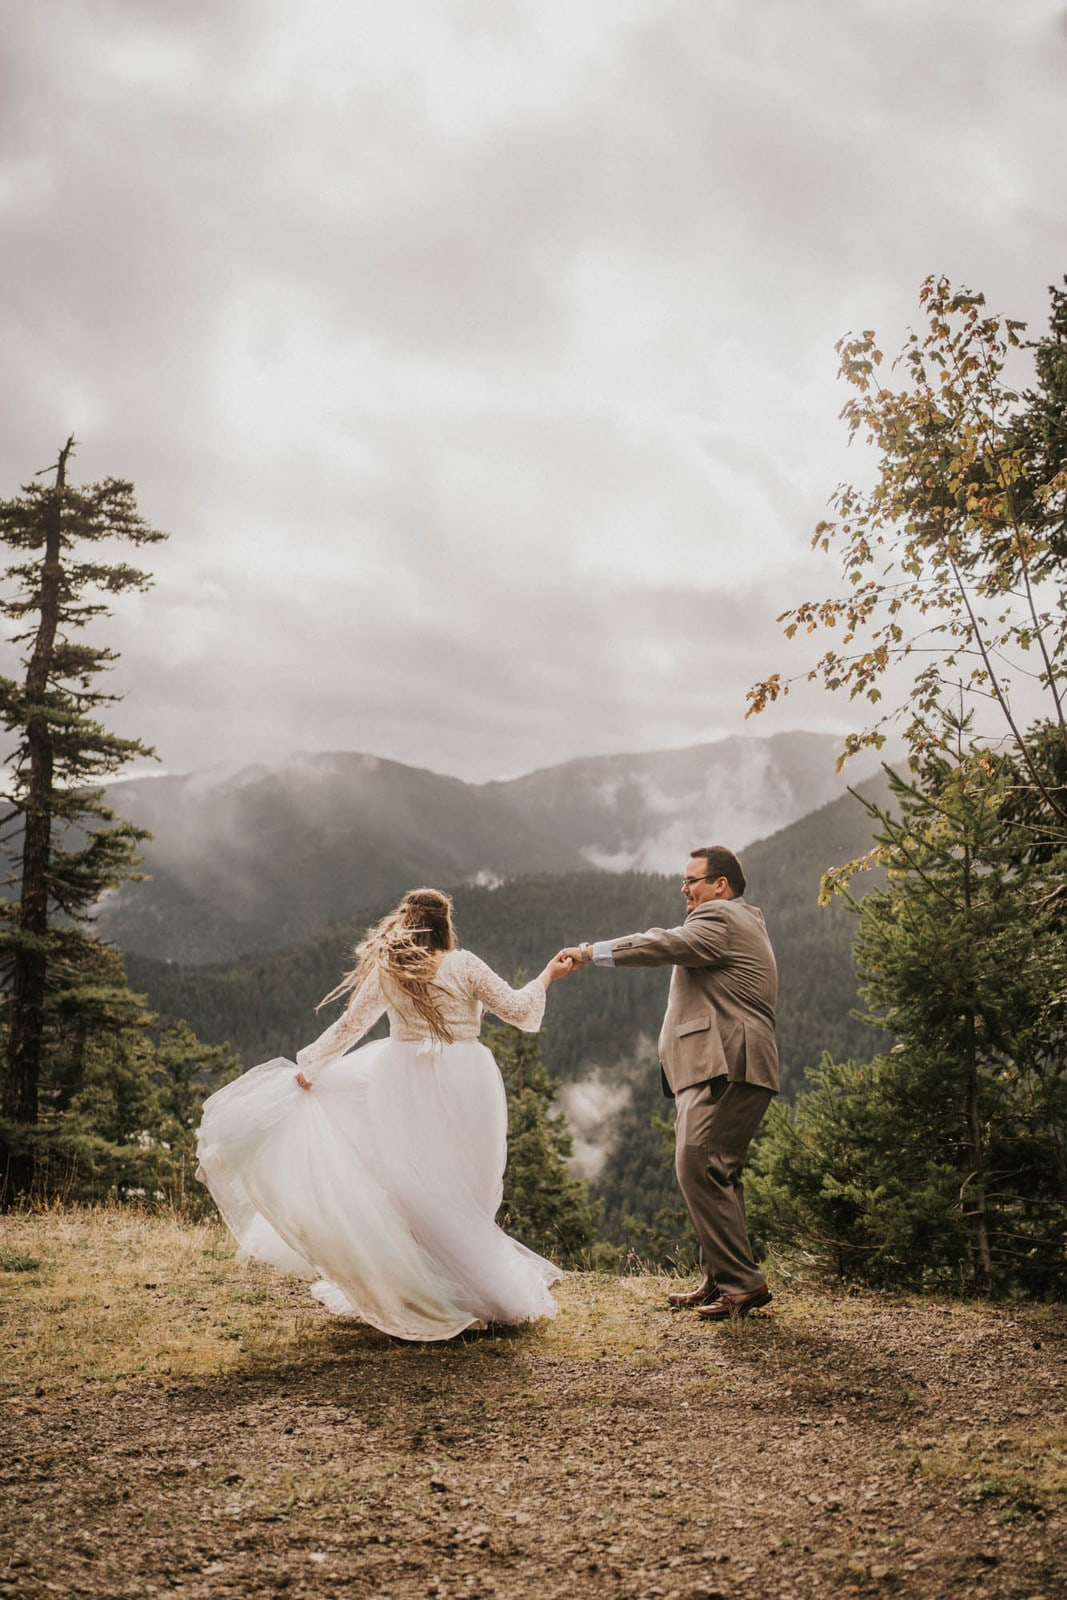 groom twirling bride at hurricane ridge elopement